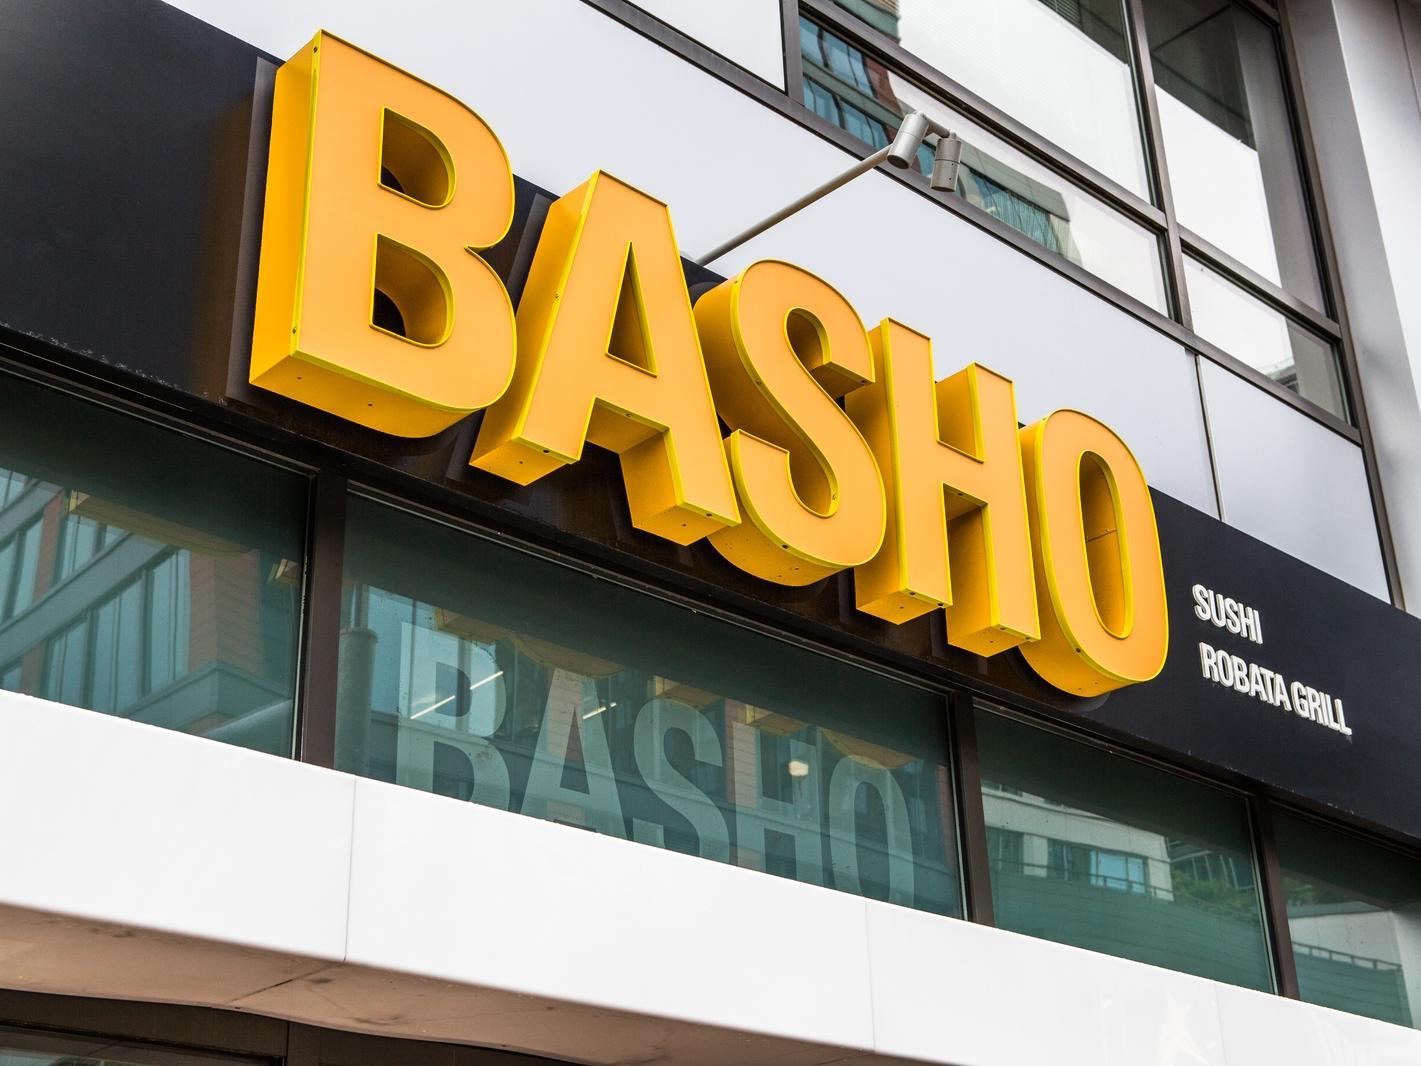 Basho Grill Restaurant Exterior